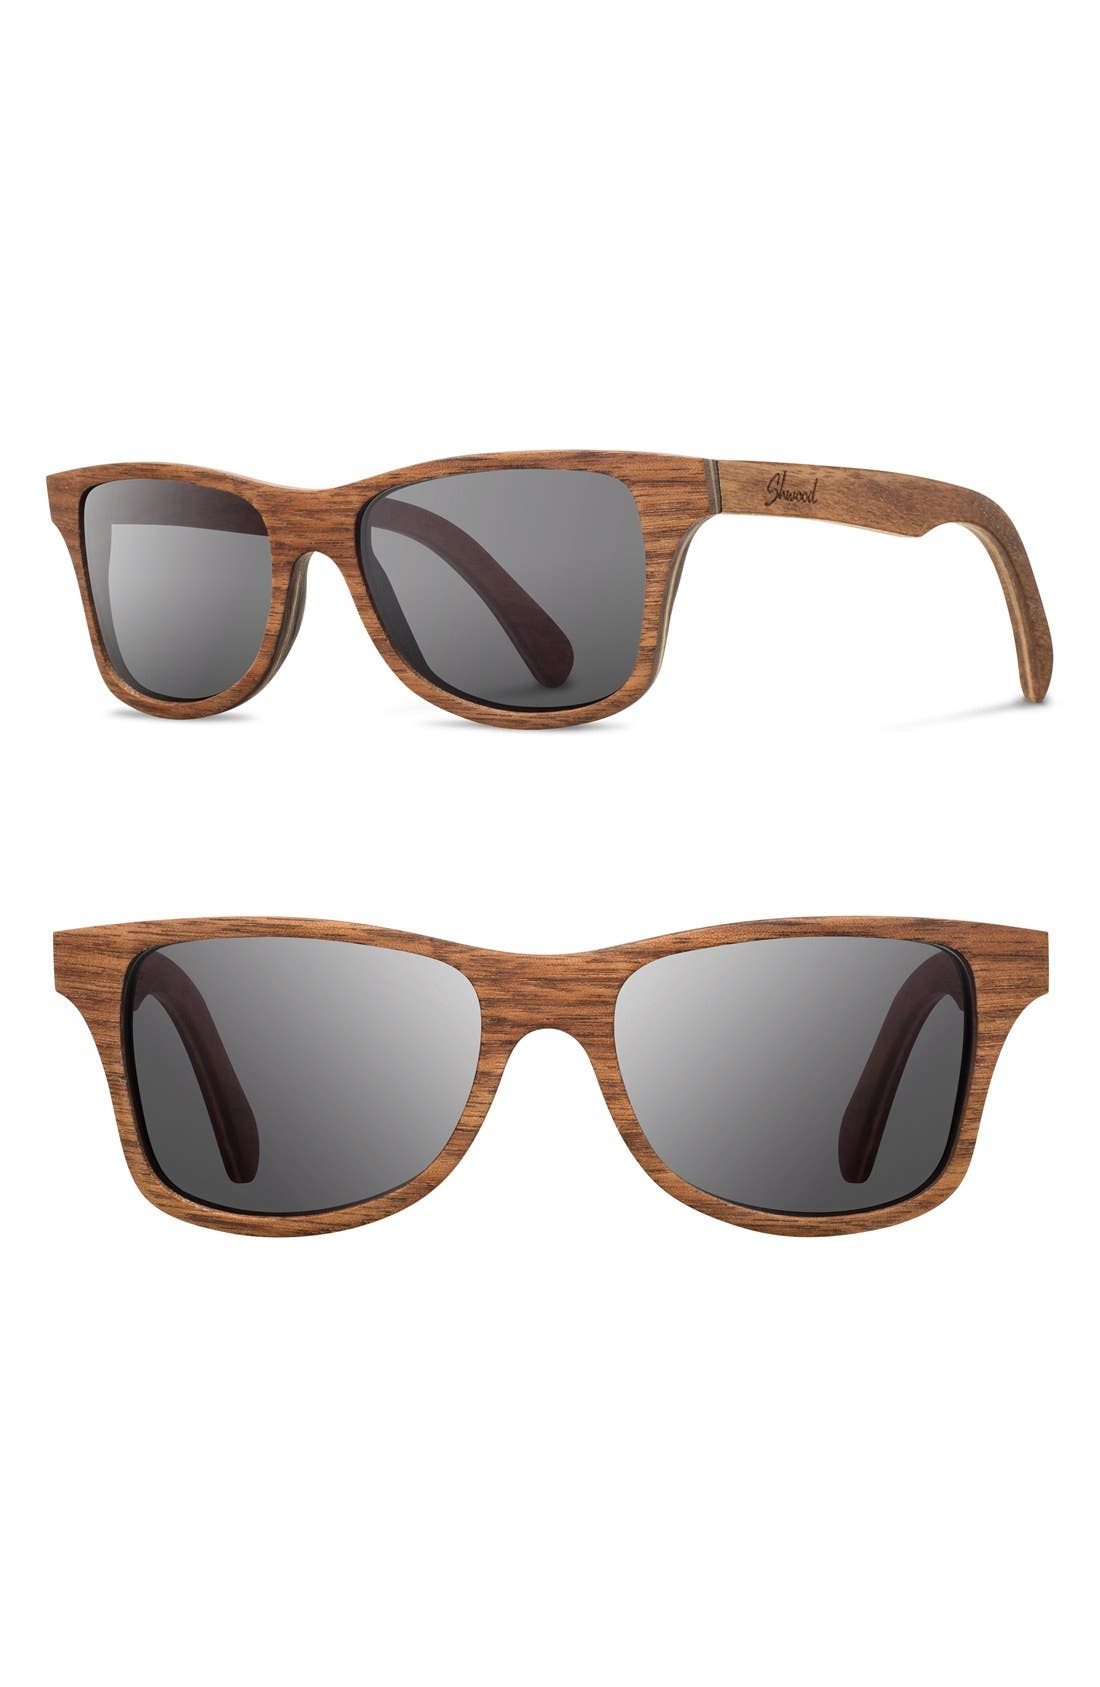 SHWOOD Canby 54mm Wood Sunglasses